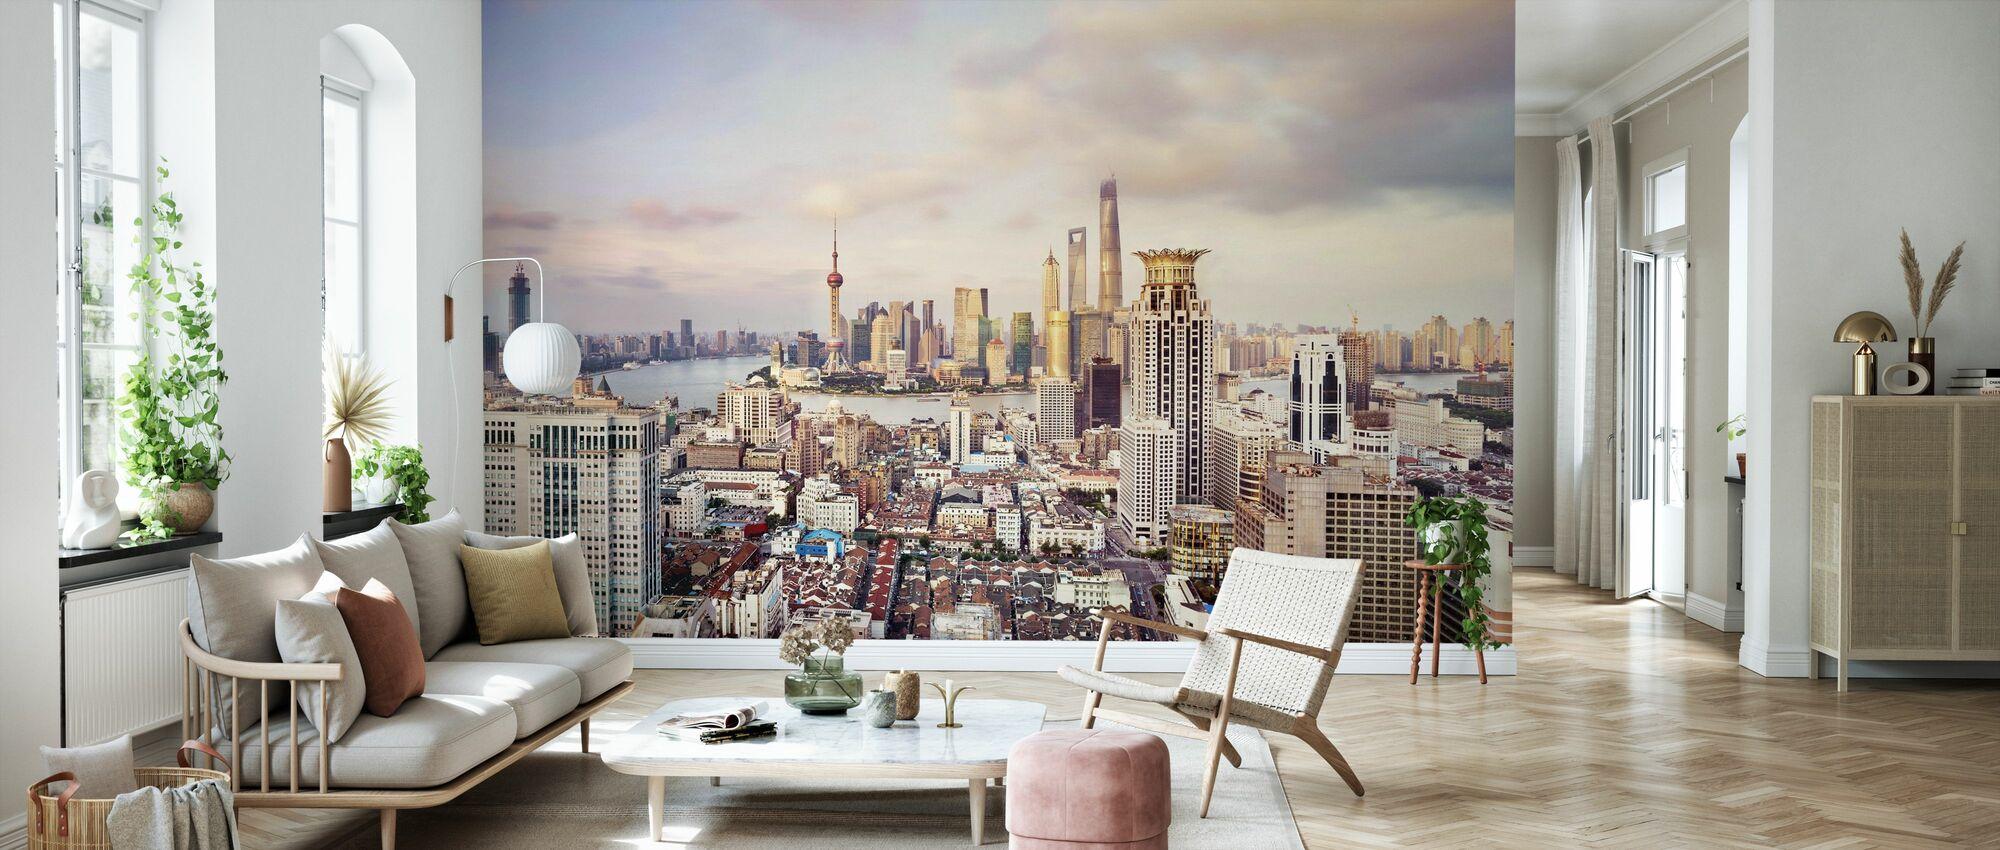 Shanghai Skyline - Tapet - Vardagsrum